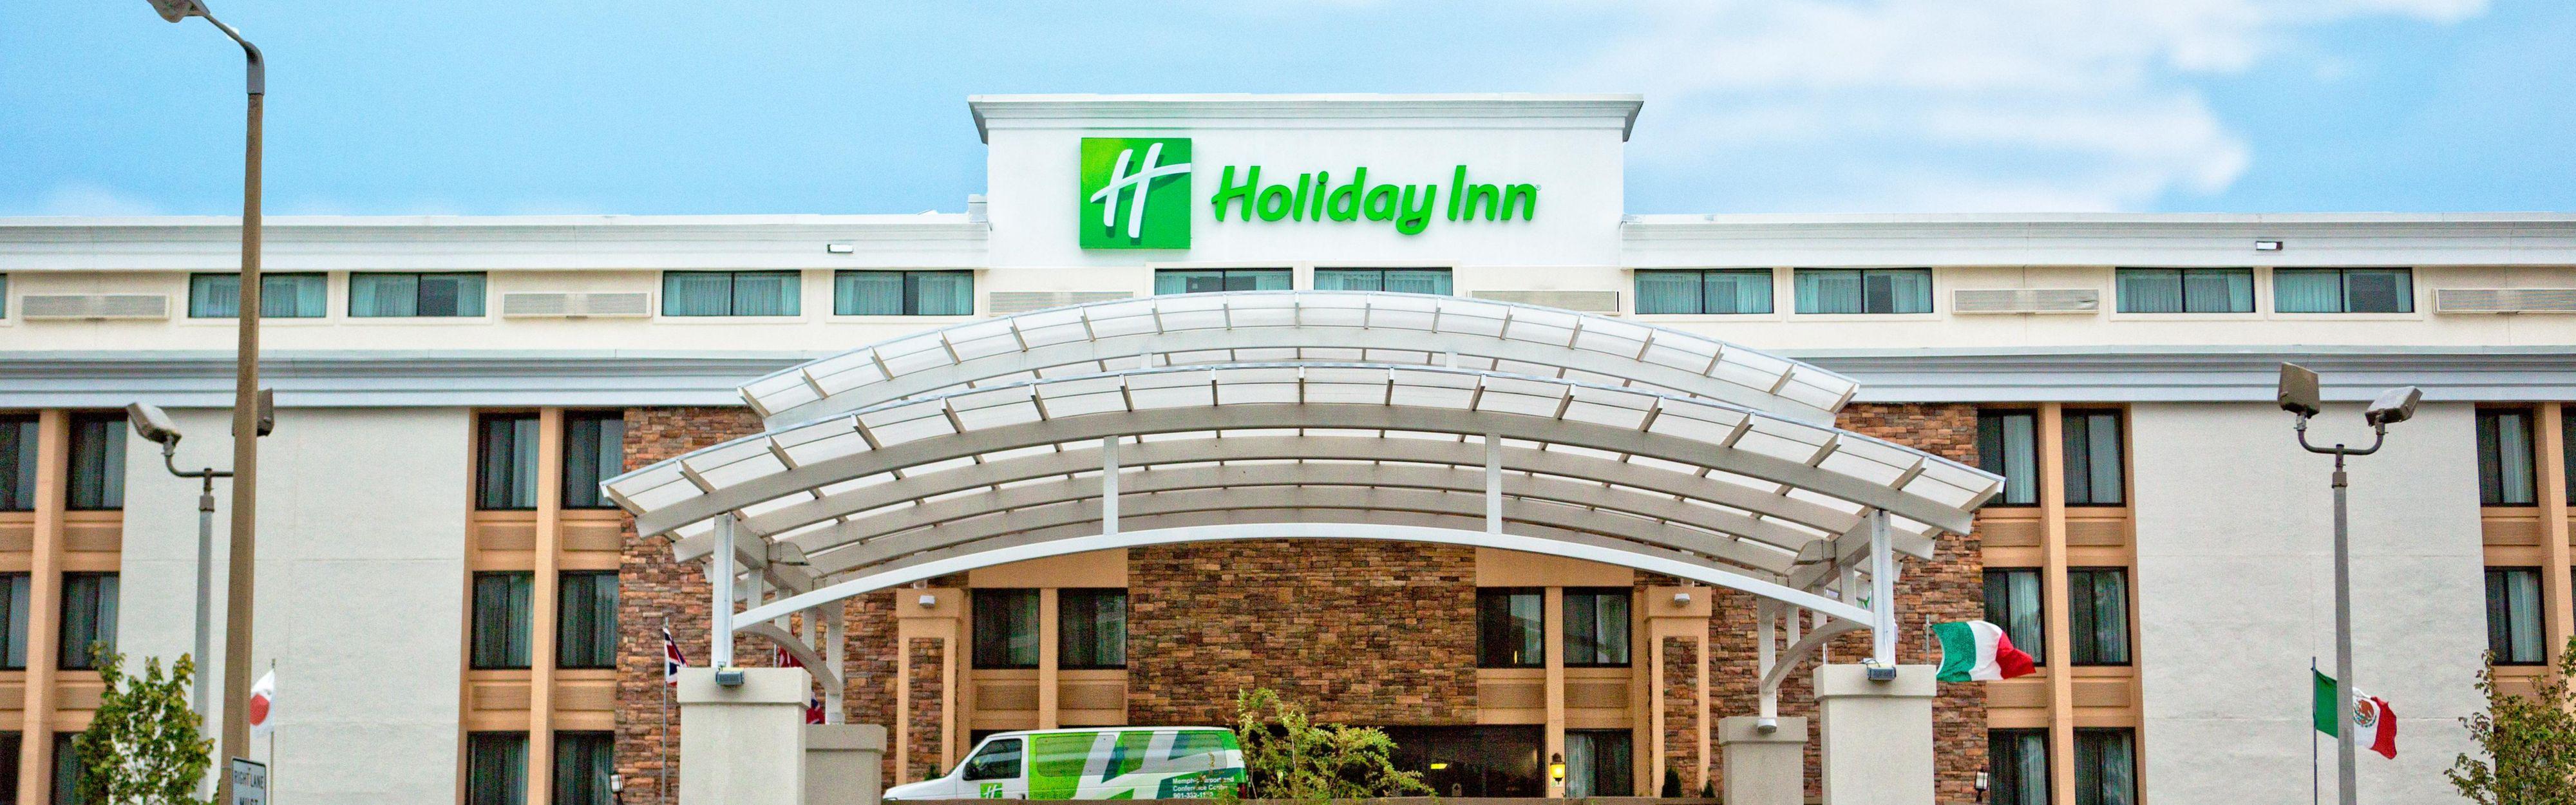 Hotels Near Airport In Memphis Tn